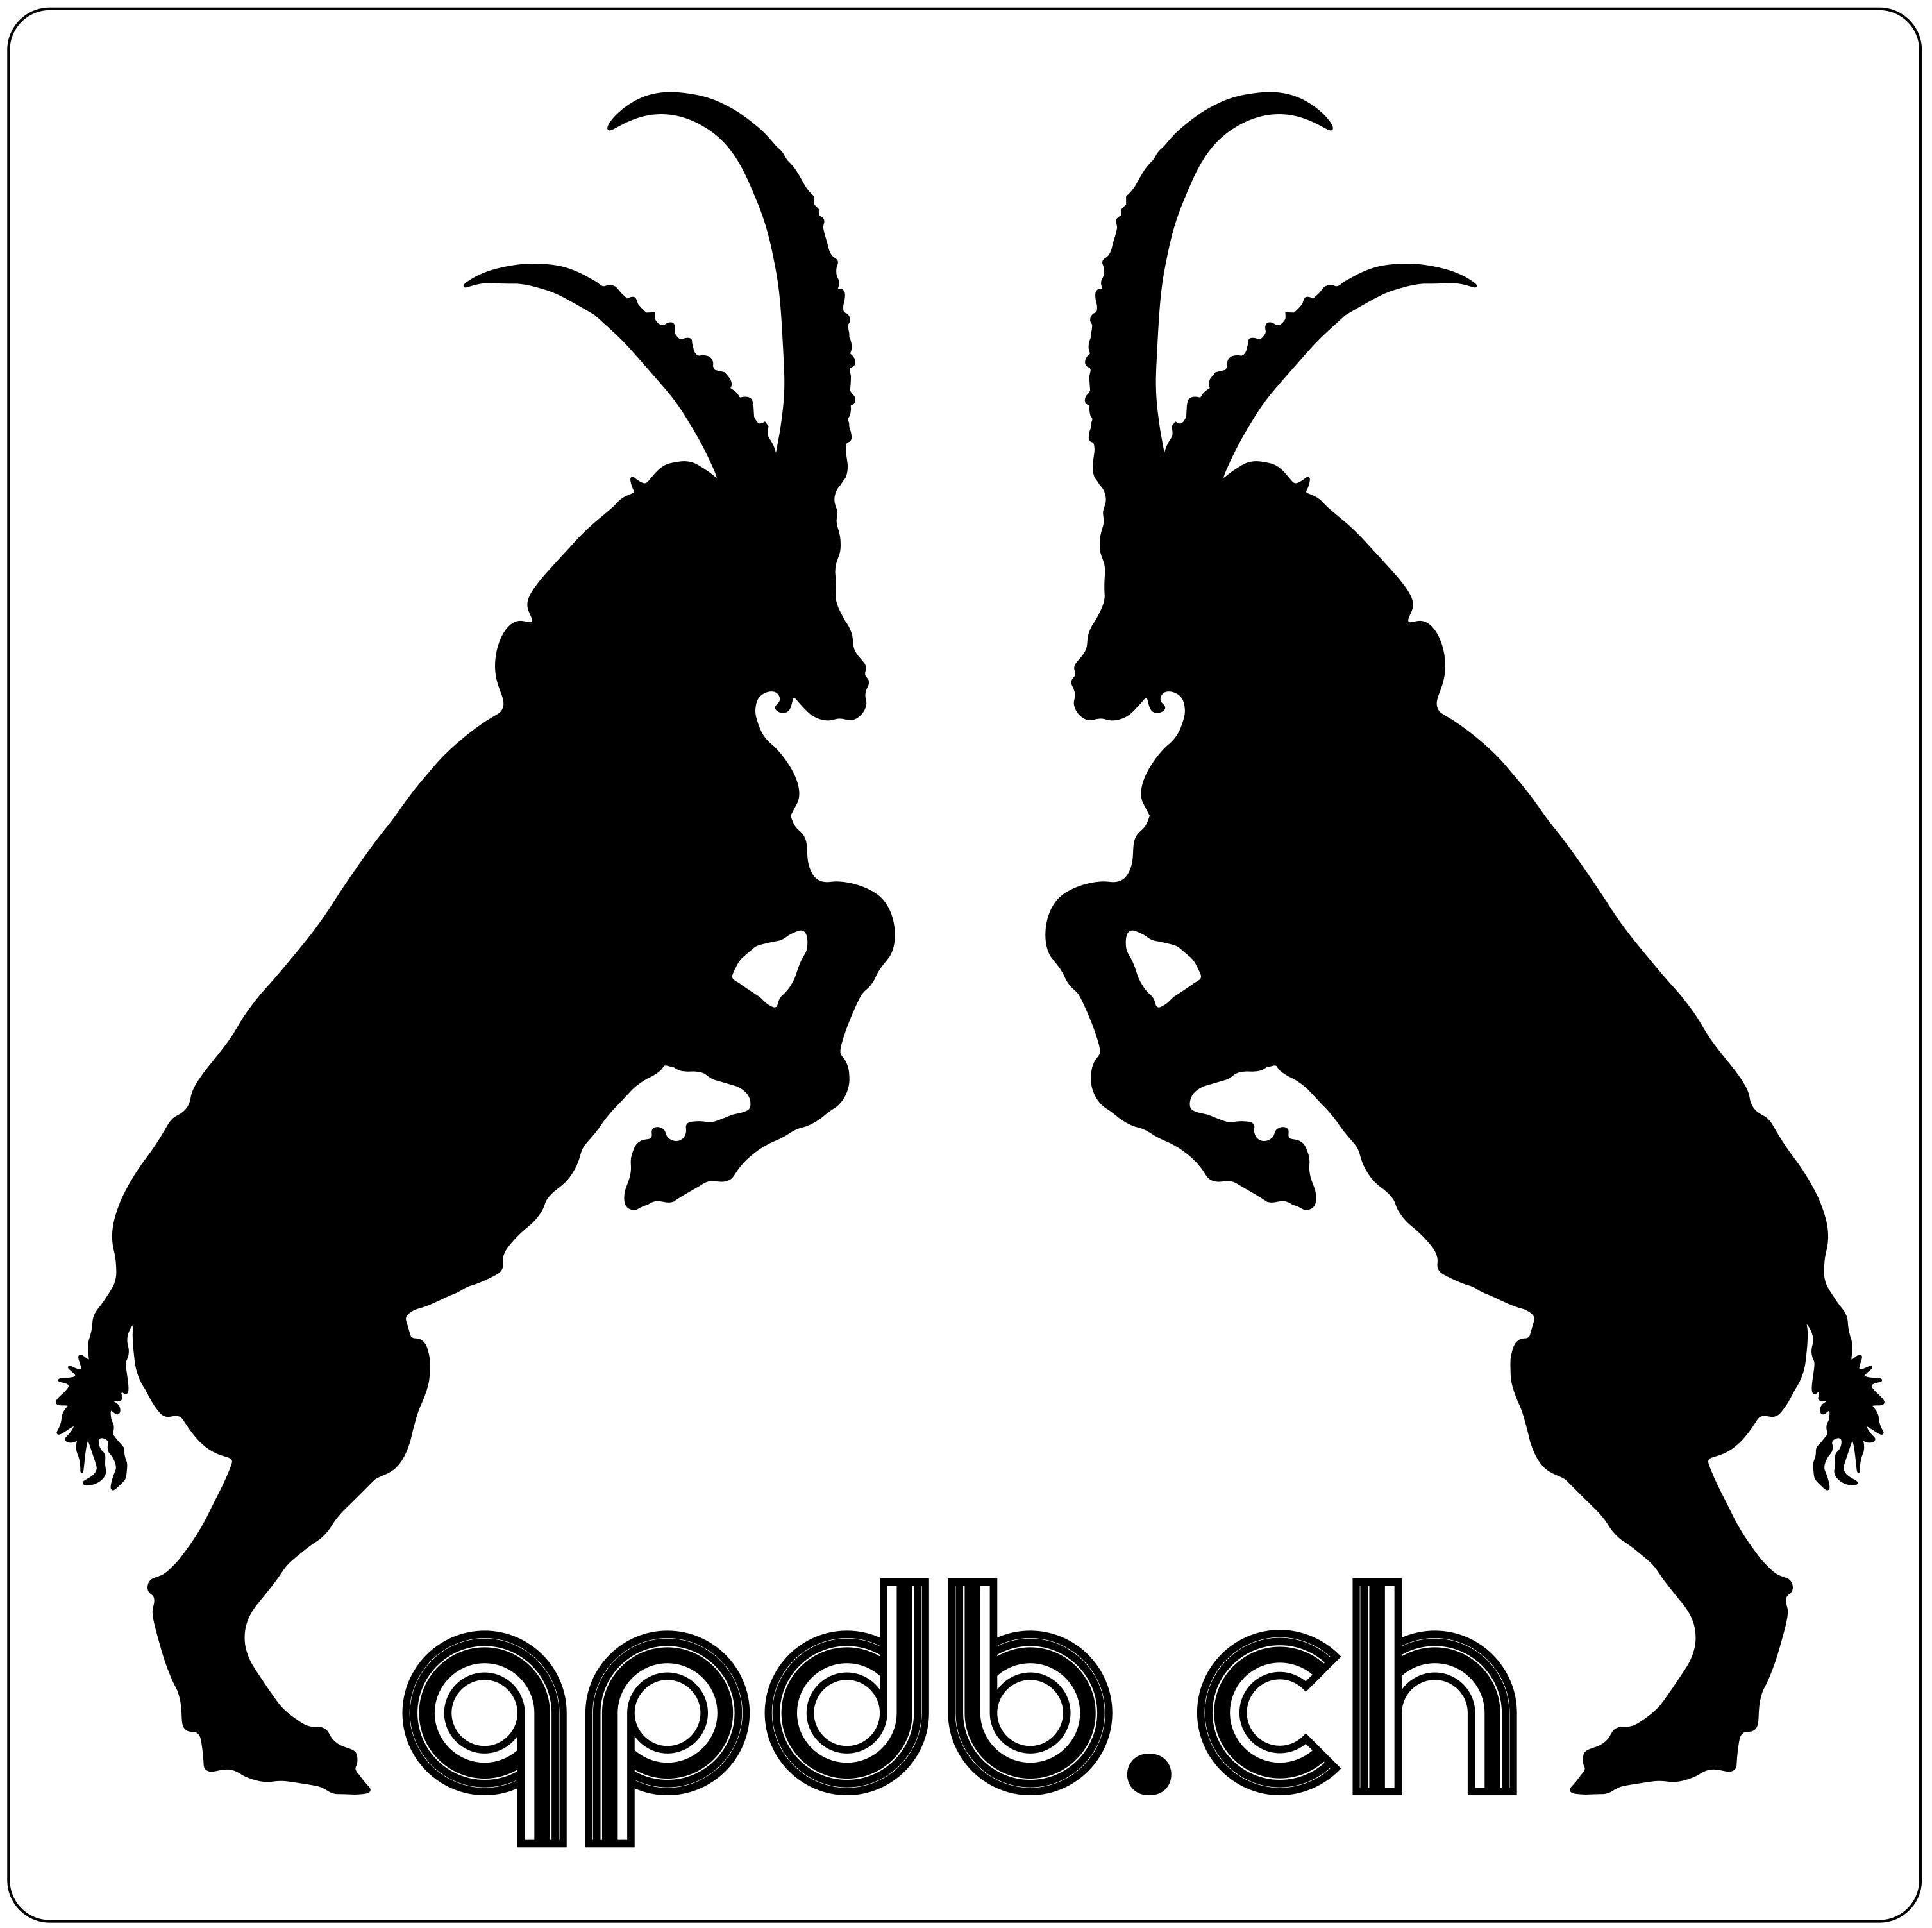 qpdb.ch